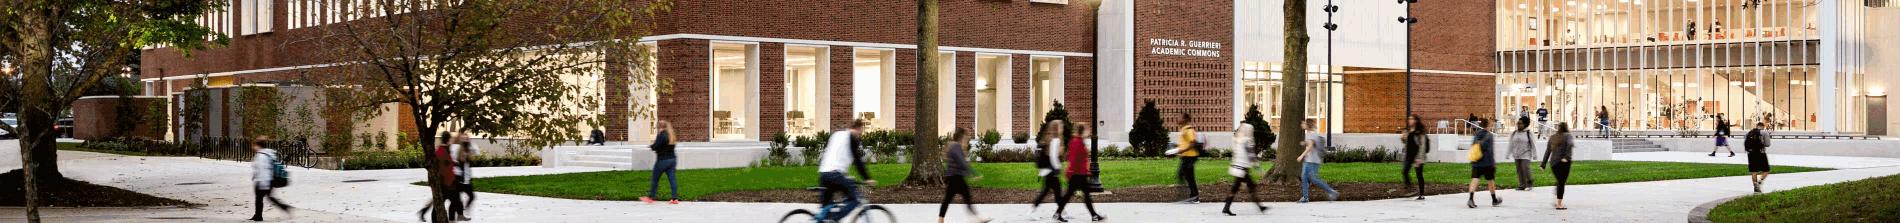 Salisbury University students on campus